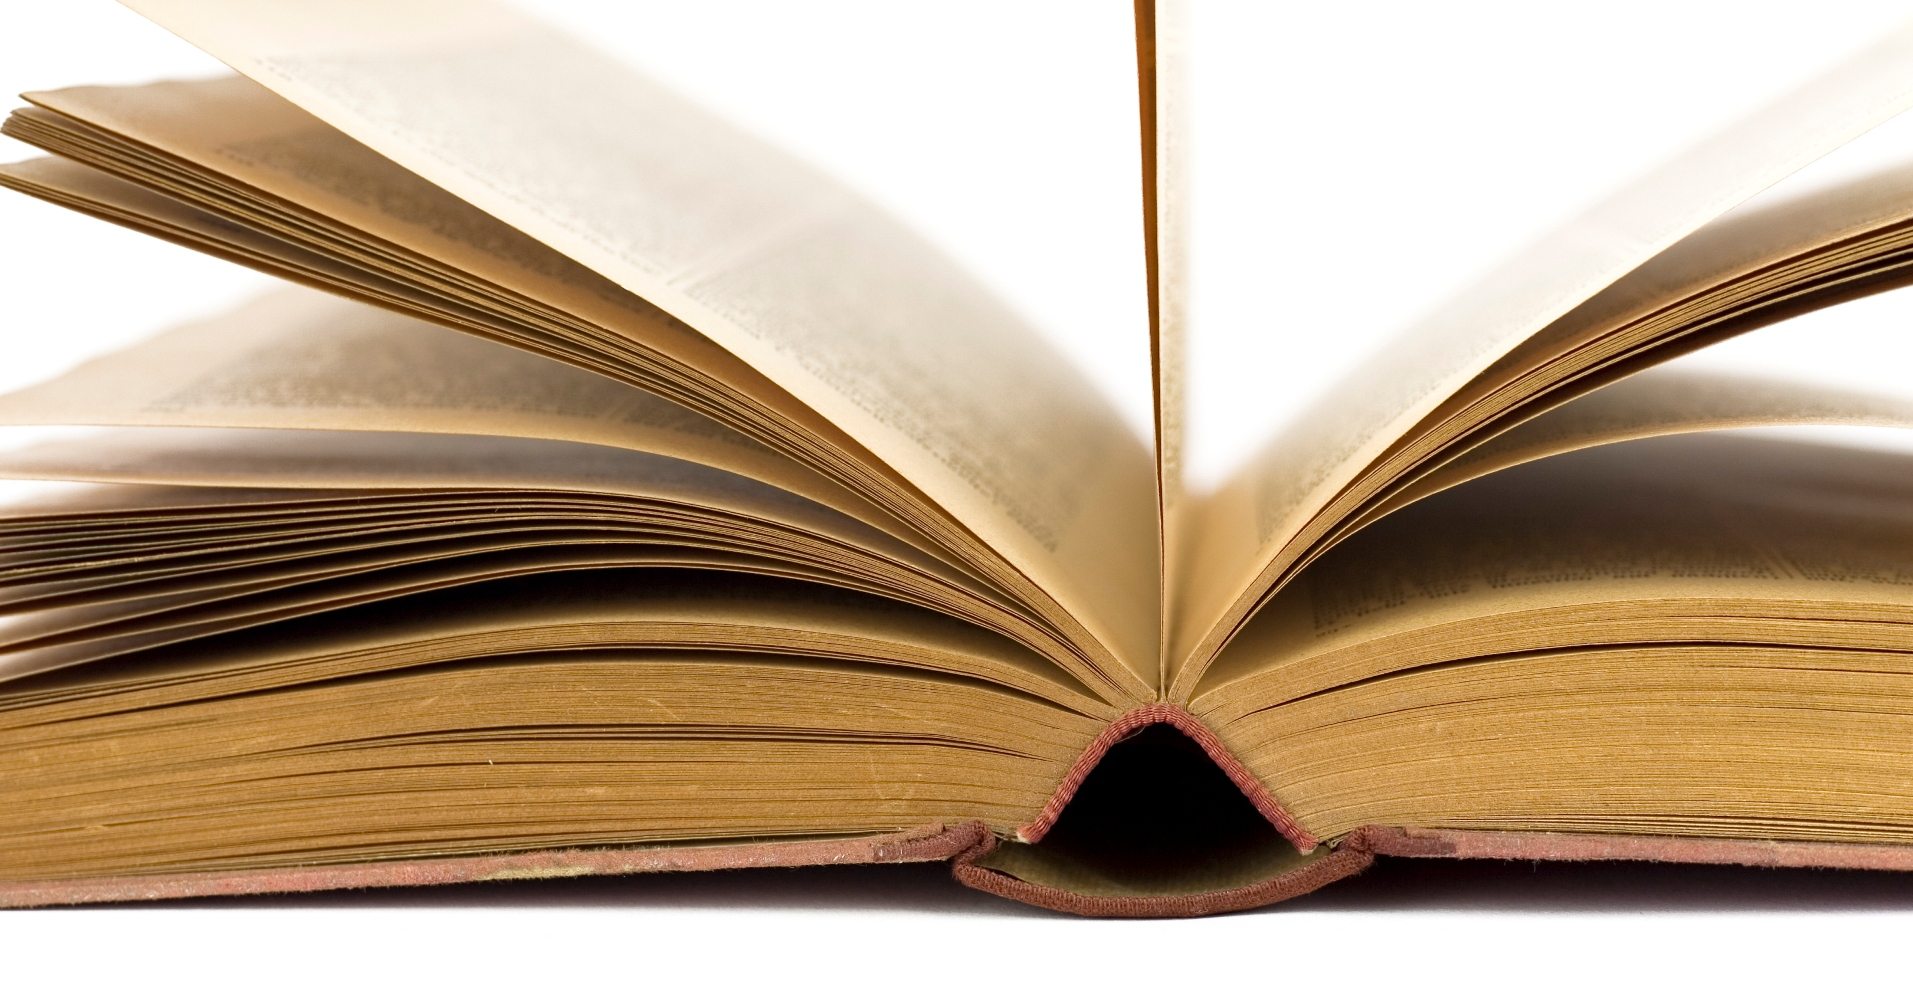 Amazonde Bestseller Die beliebtesten Artikel in Kindle